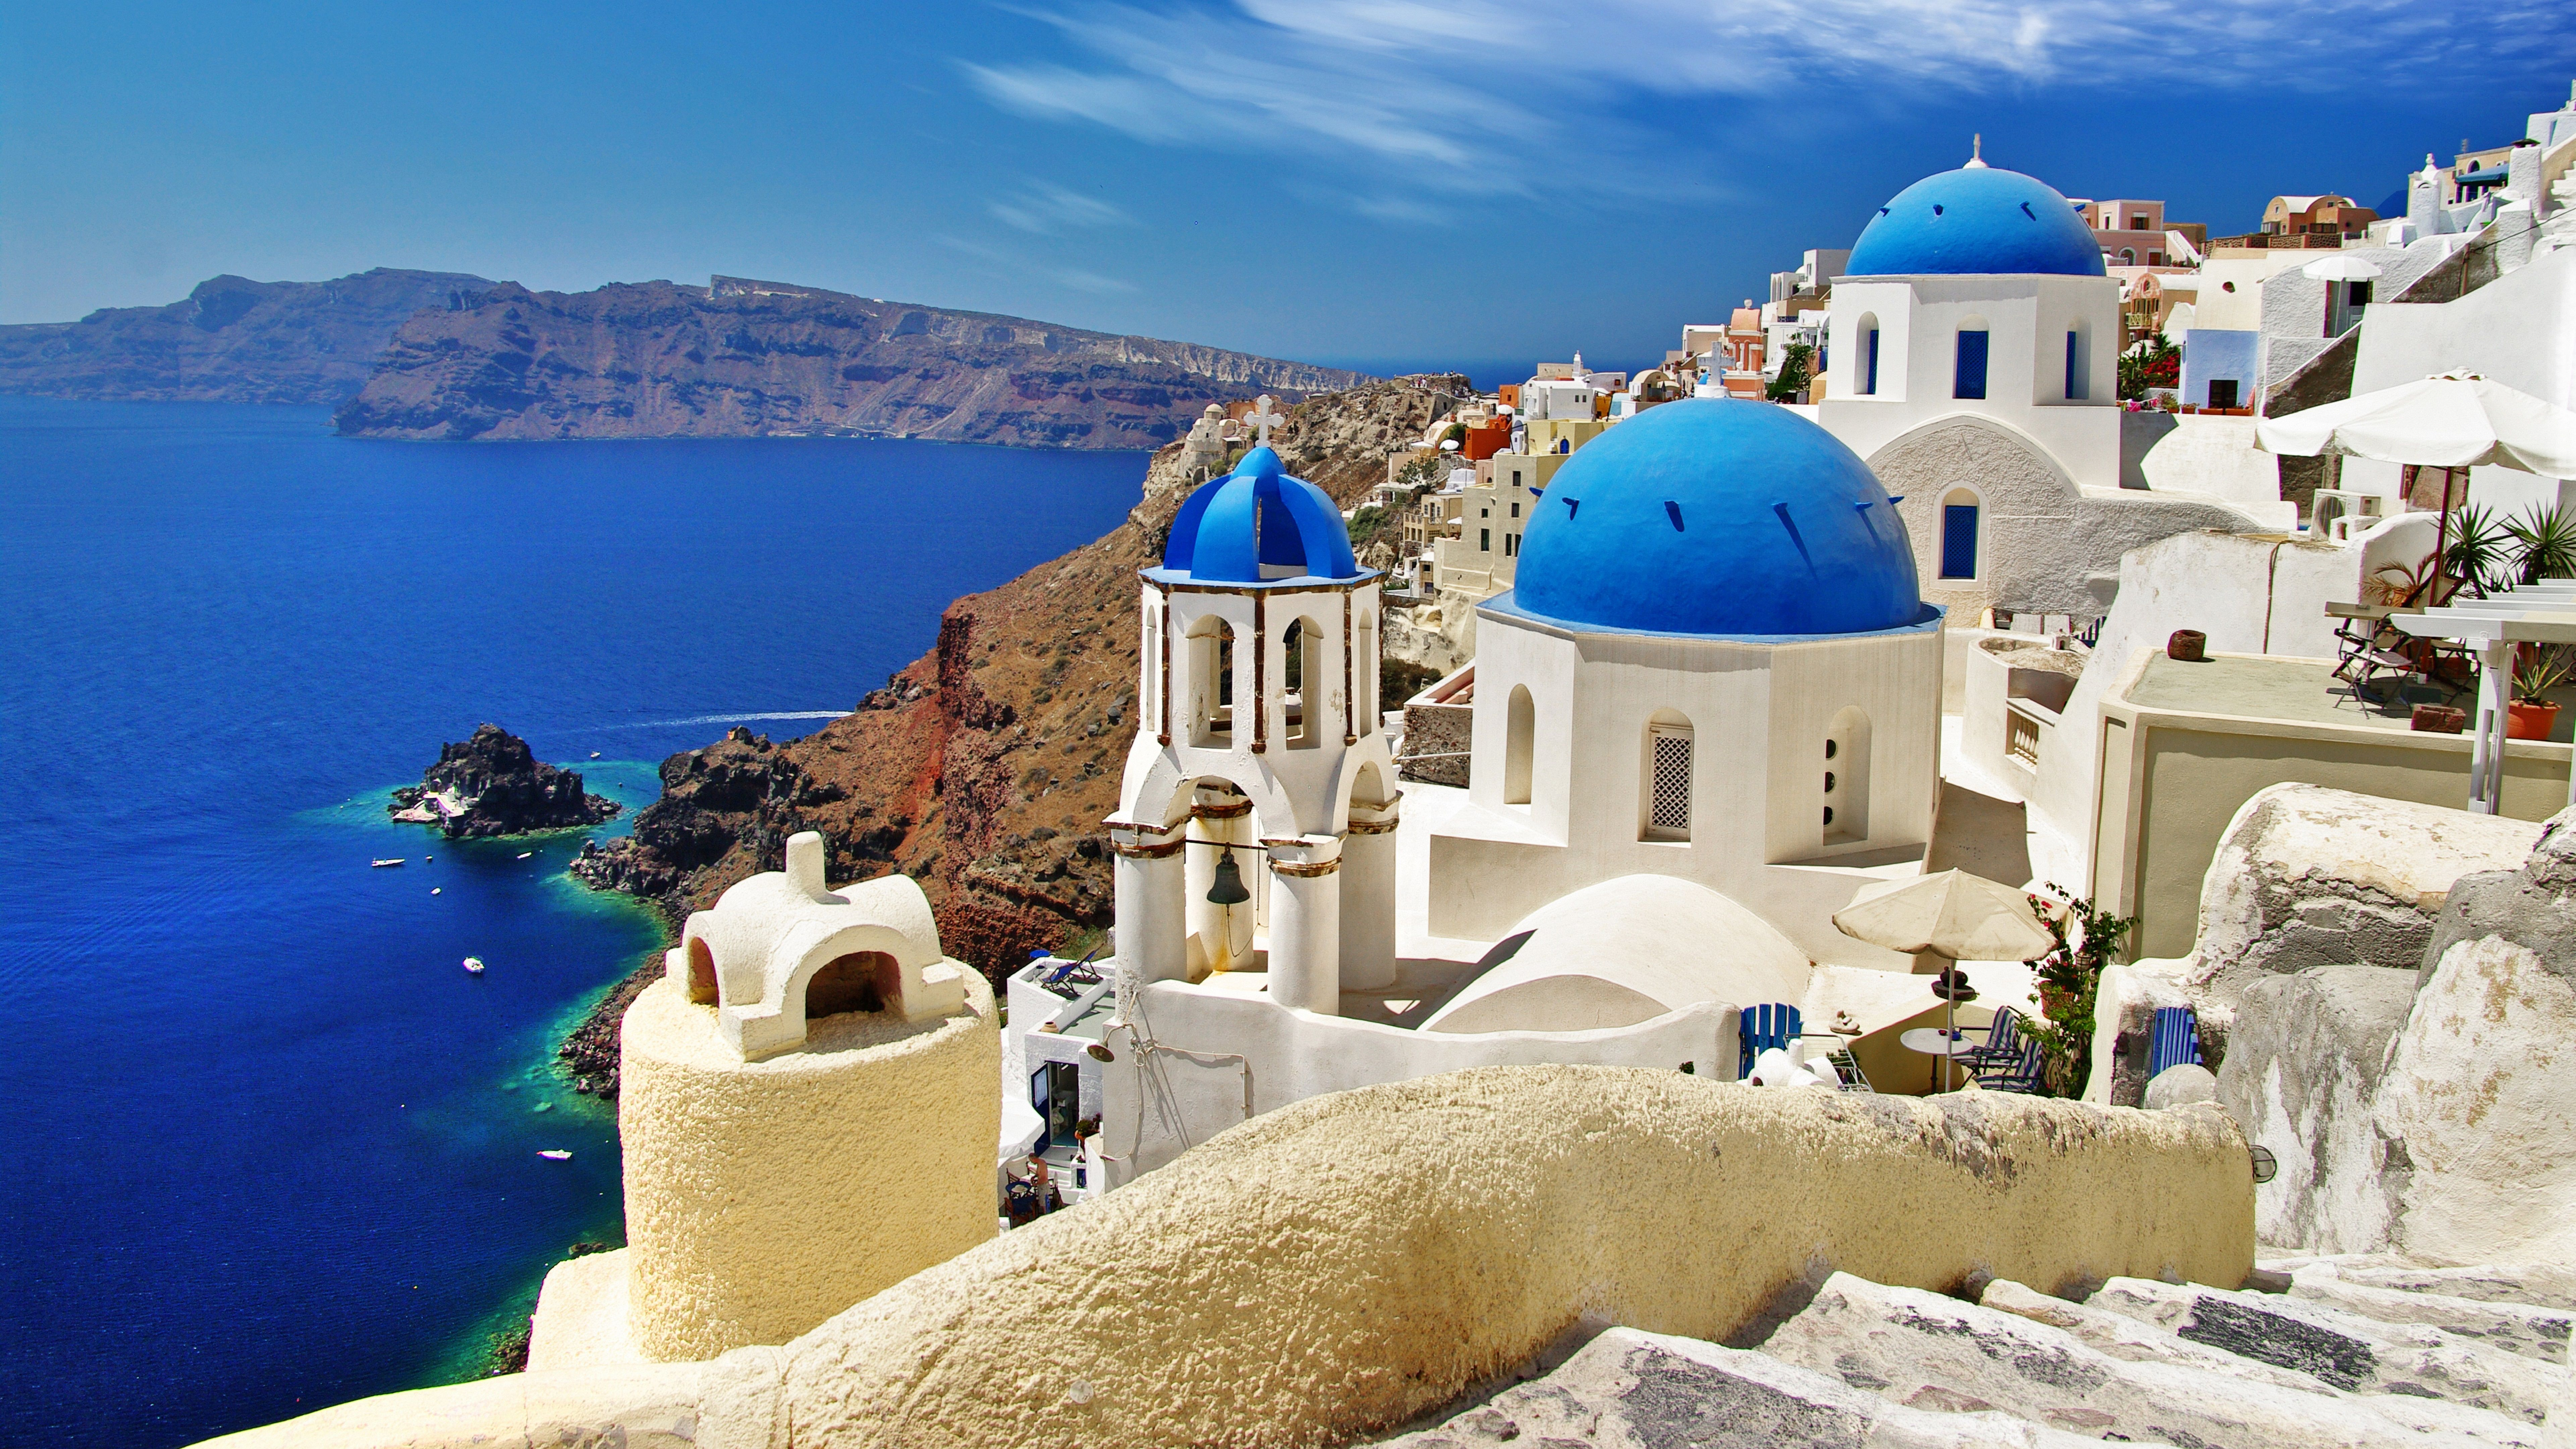 Santorini Greece Wallpapers Top Free Santorini Greece